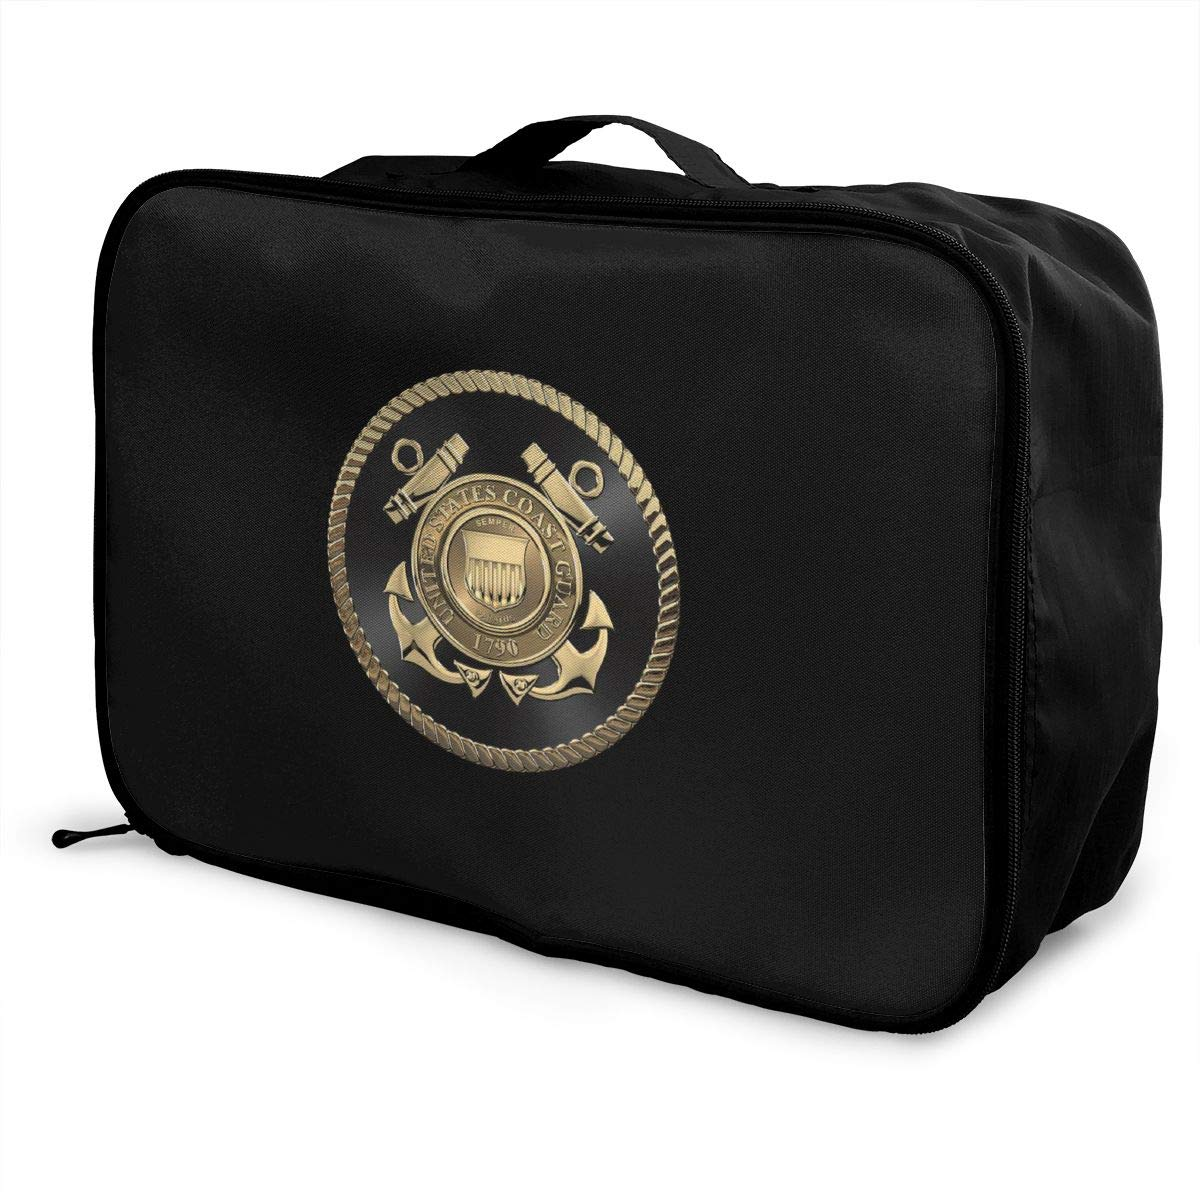 U S Coast Guard USCG Emblem Travel Carry Luggage Duffle Tote Bag